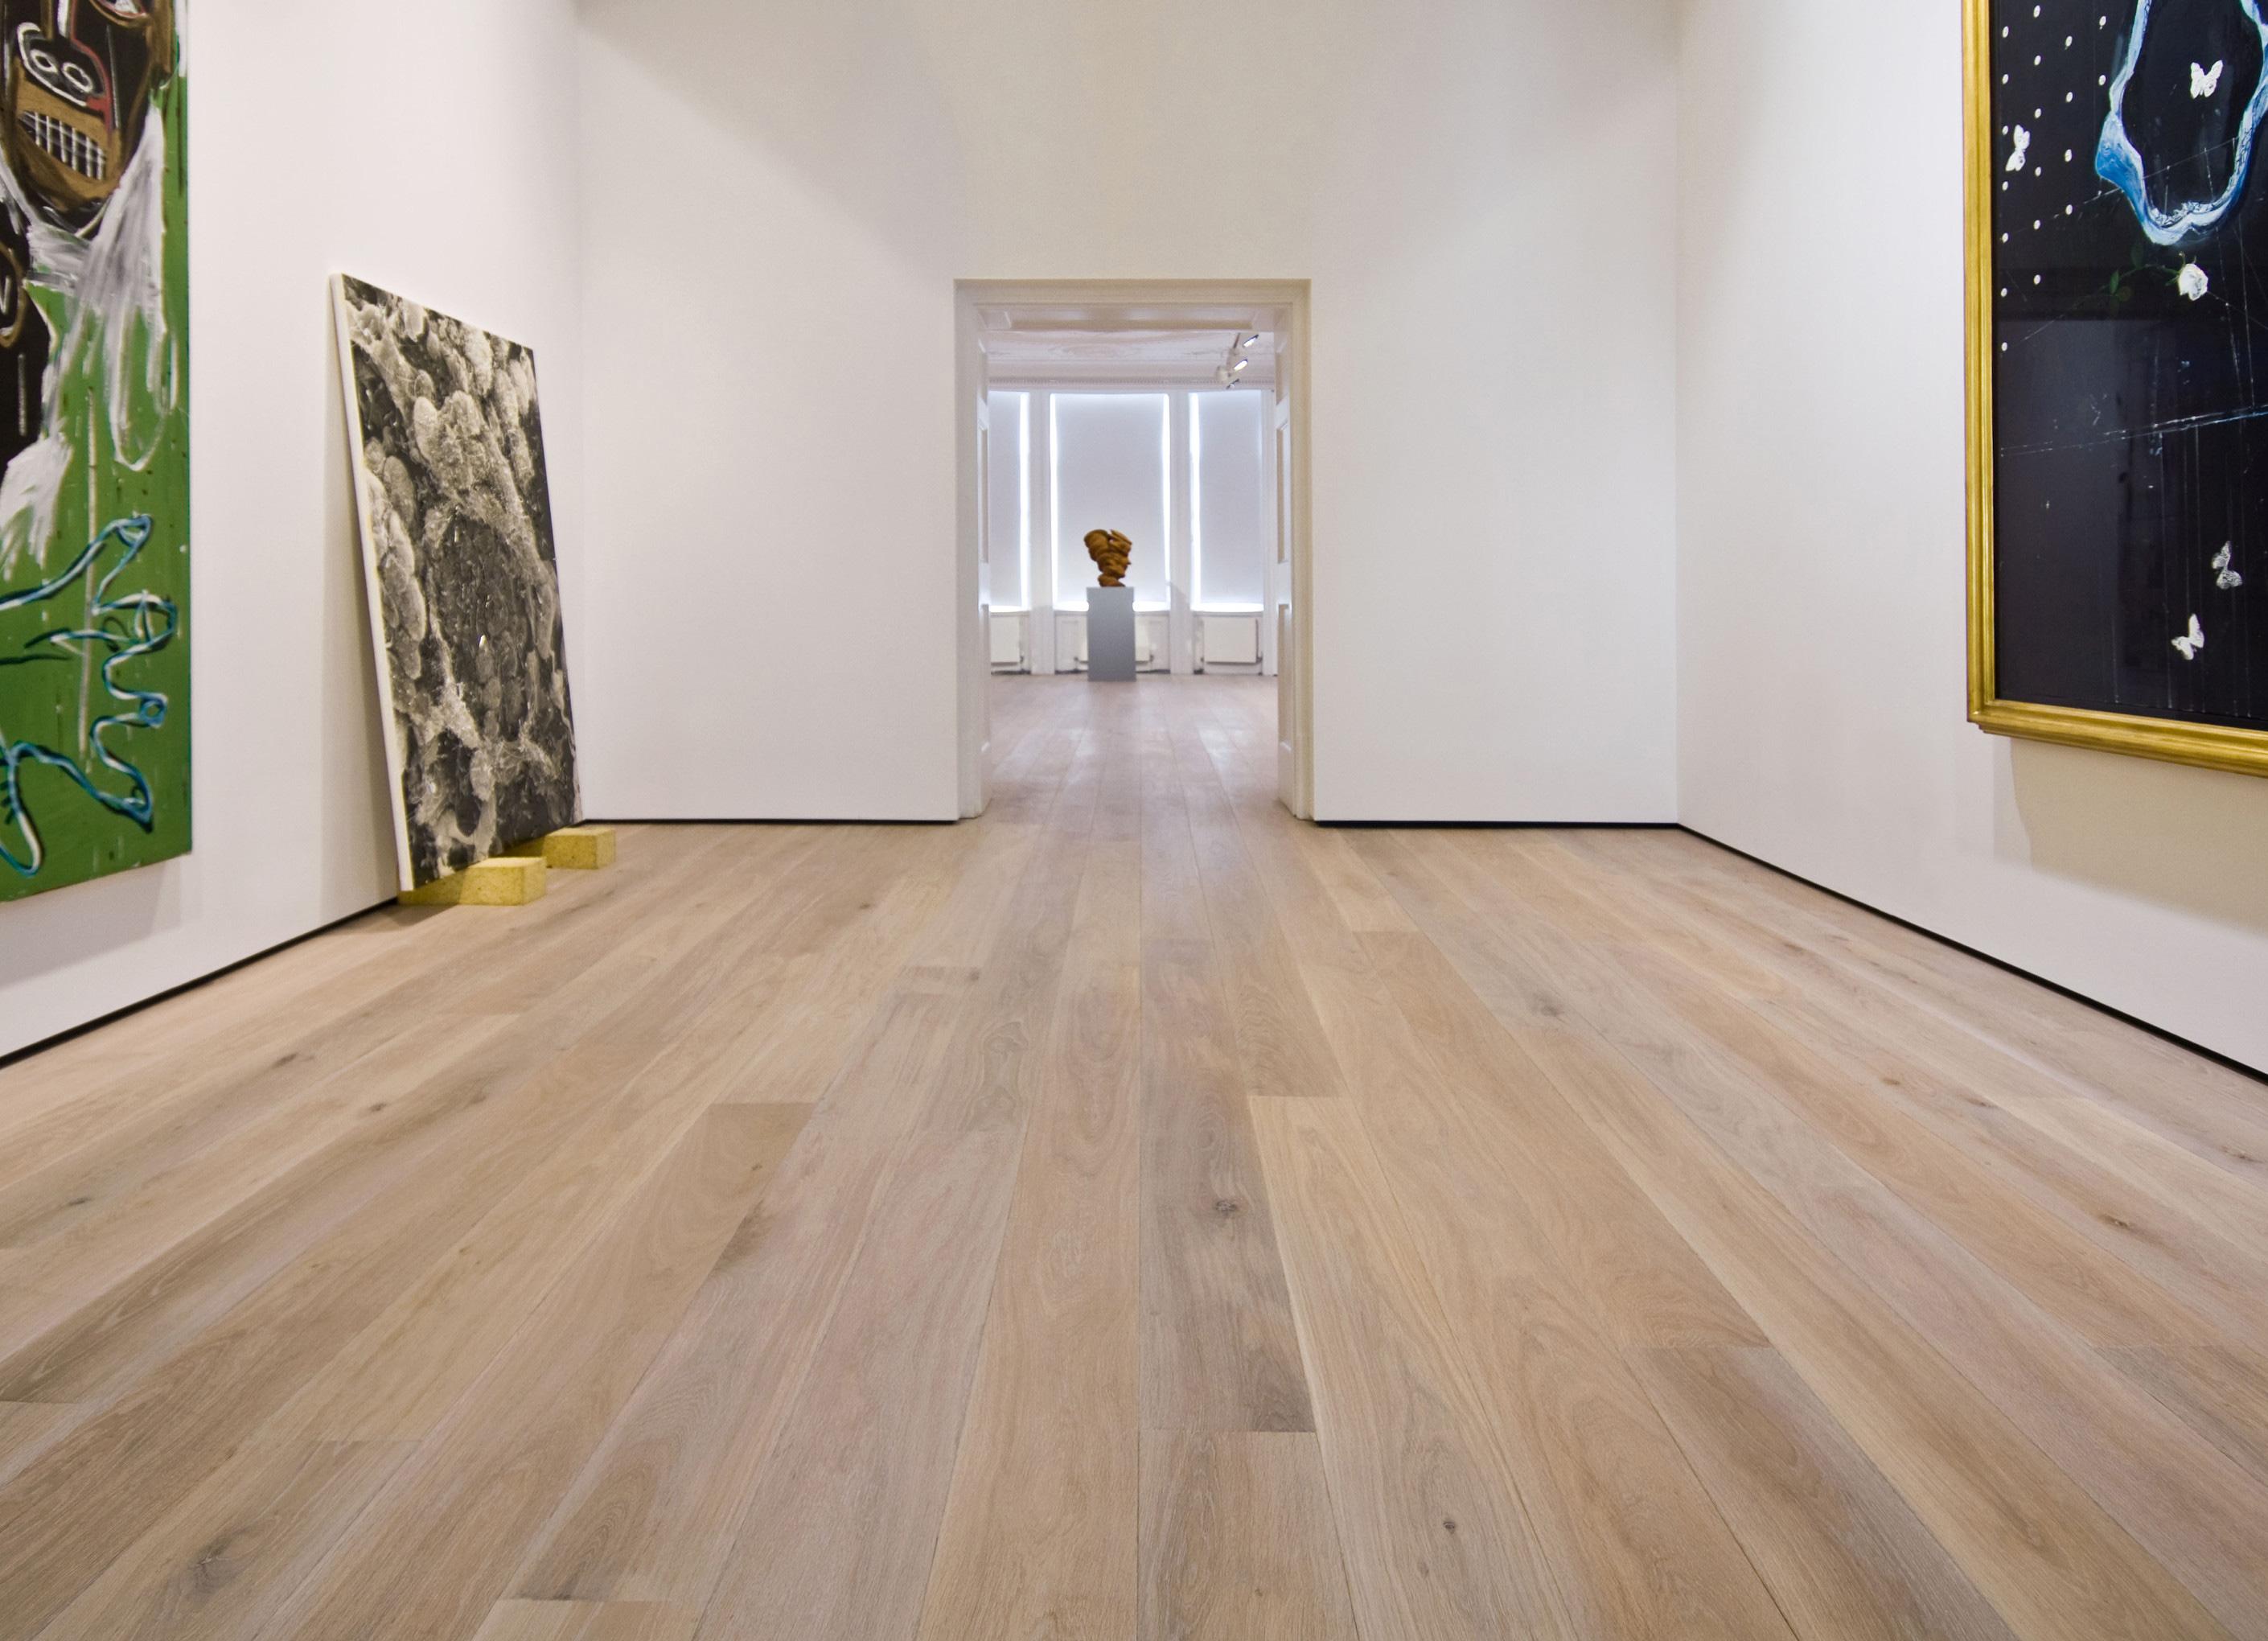 Oak landmark wakehurst plank in art gallery with central doorway